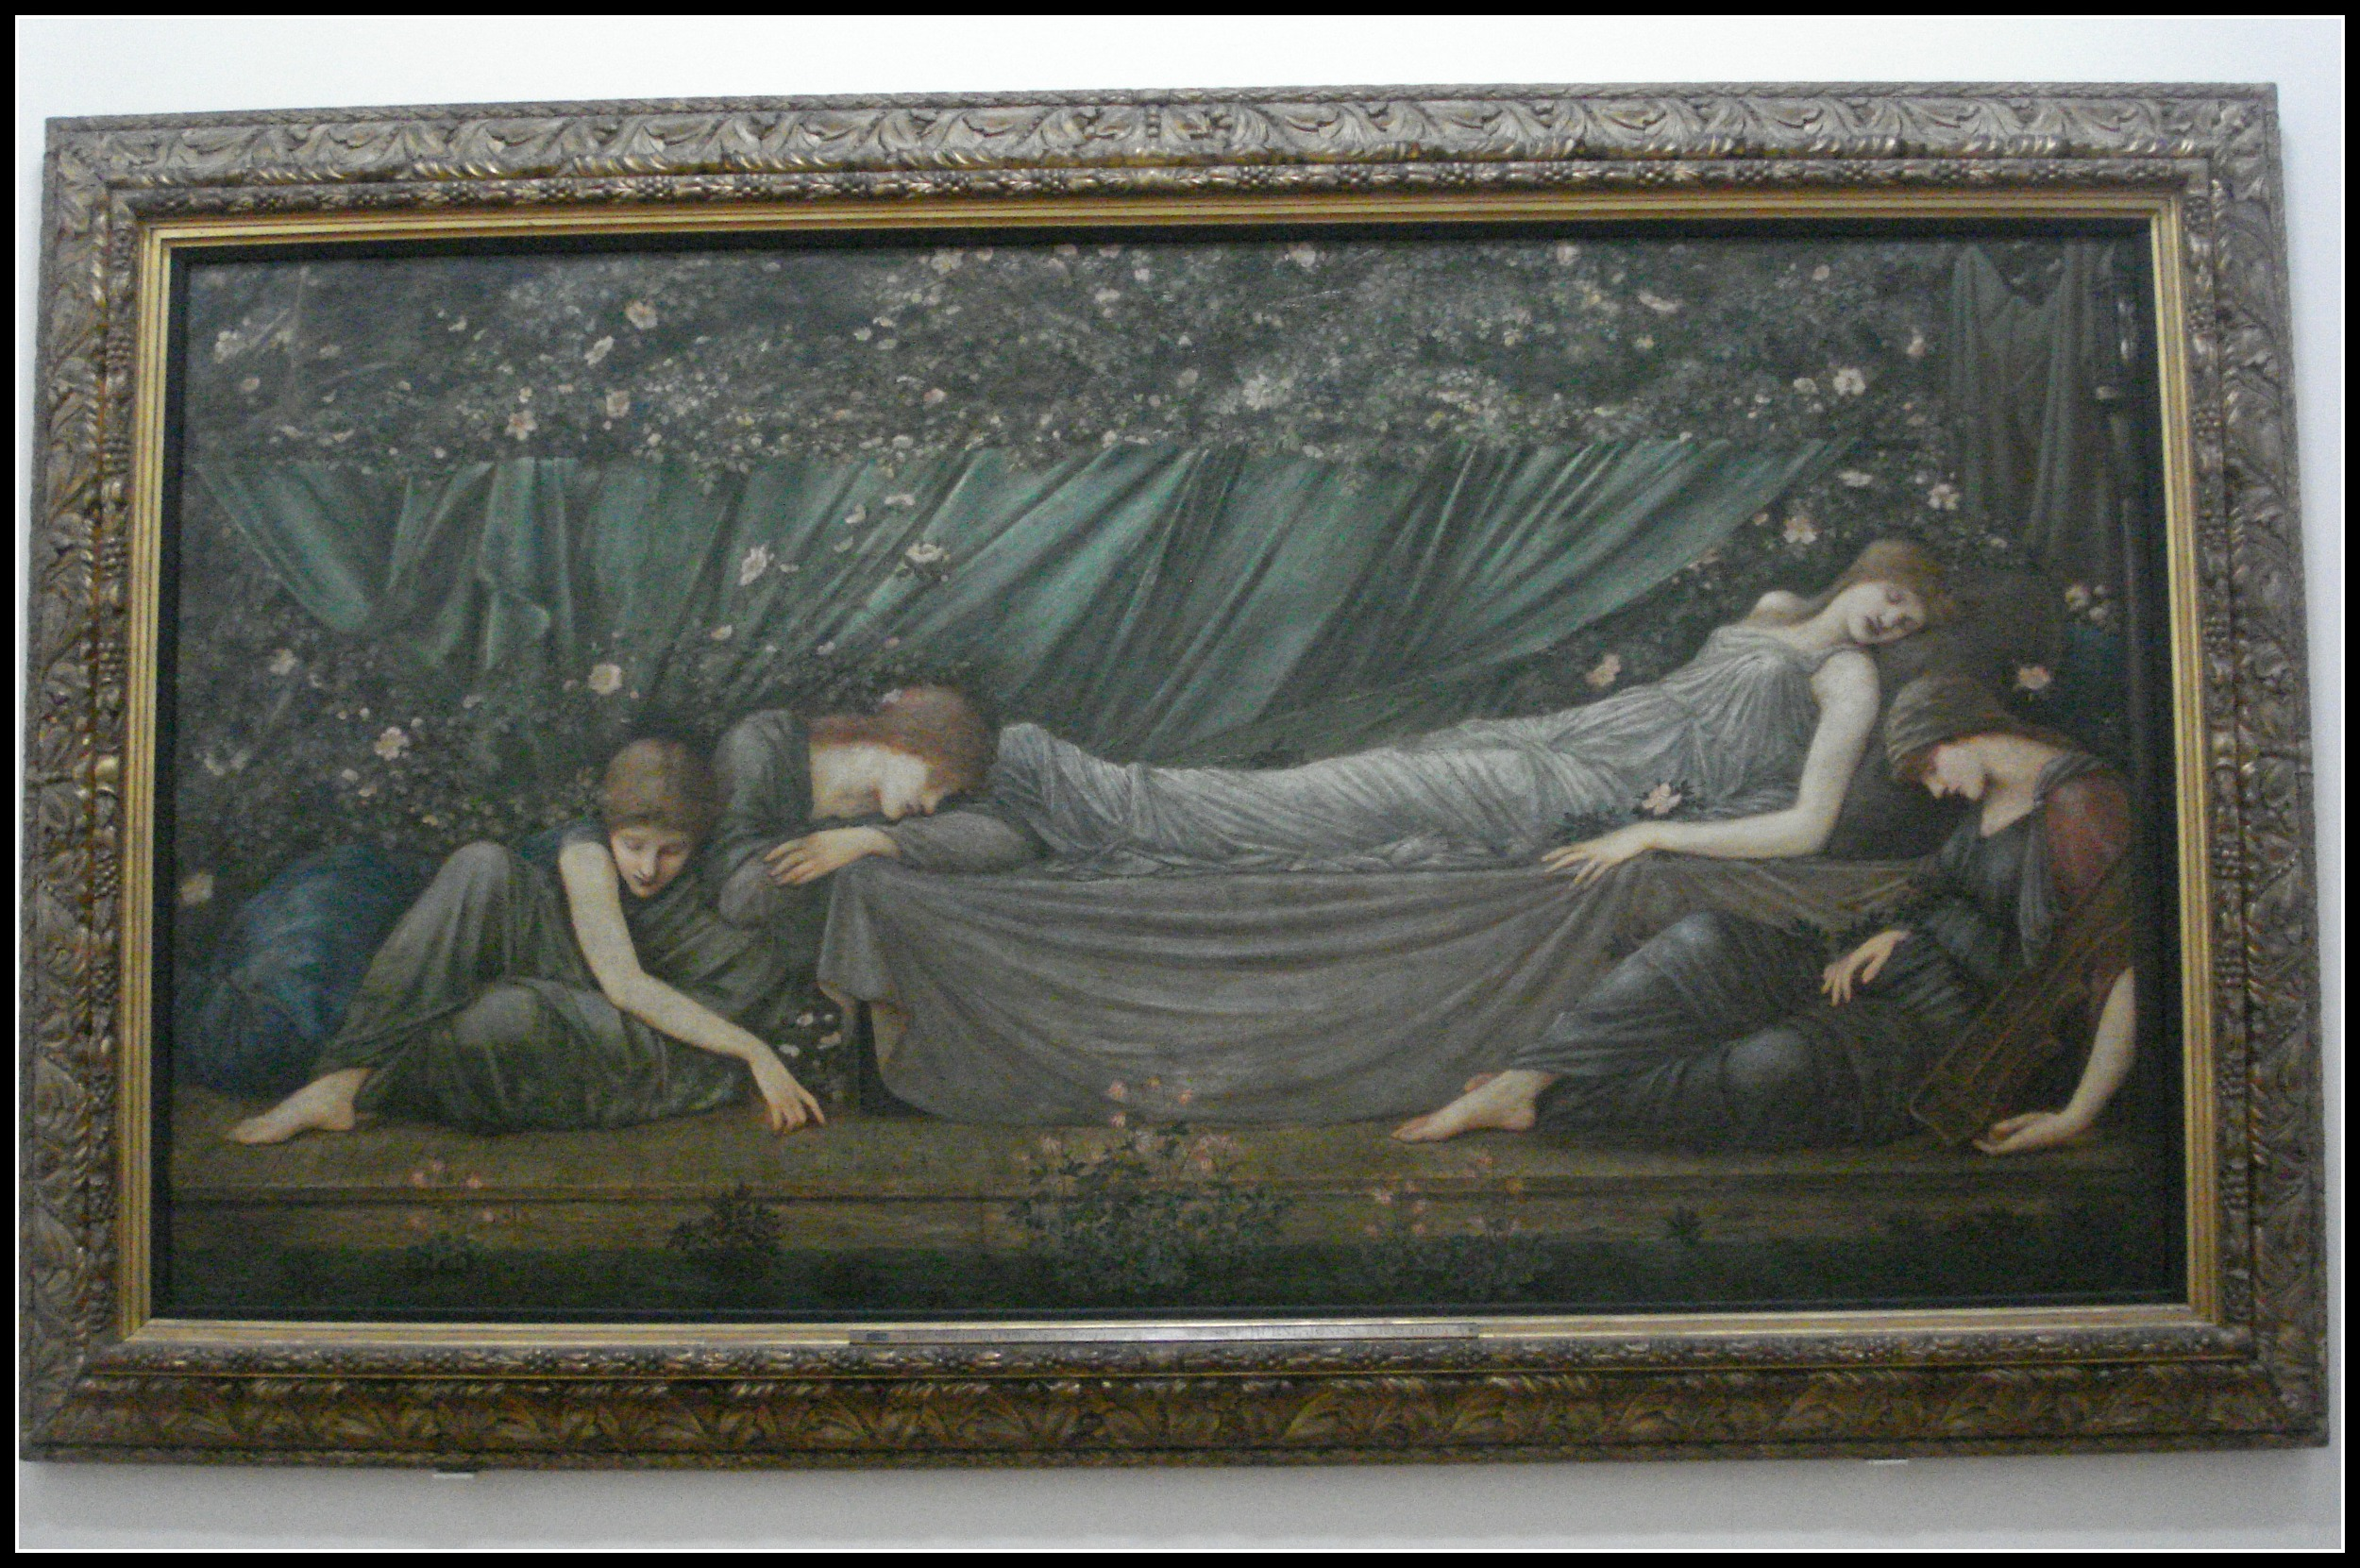 """The Sleeping Princess"" - part of the Briar Rose series by Burne-Jones."